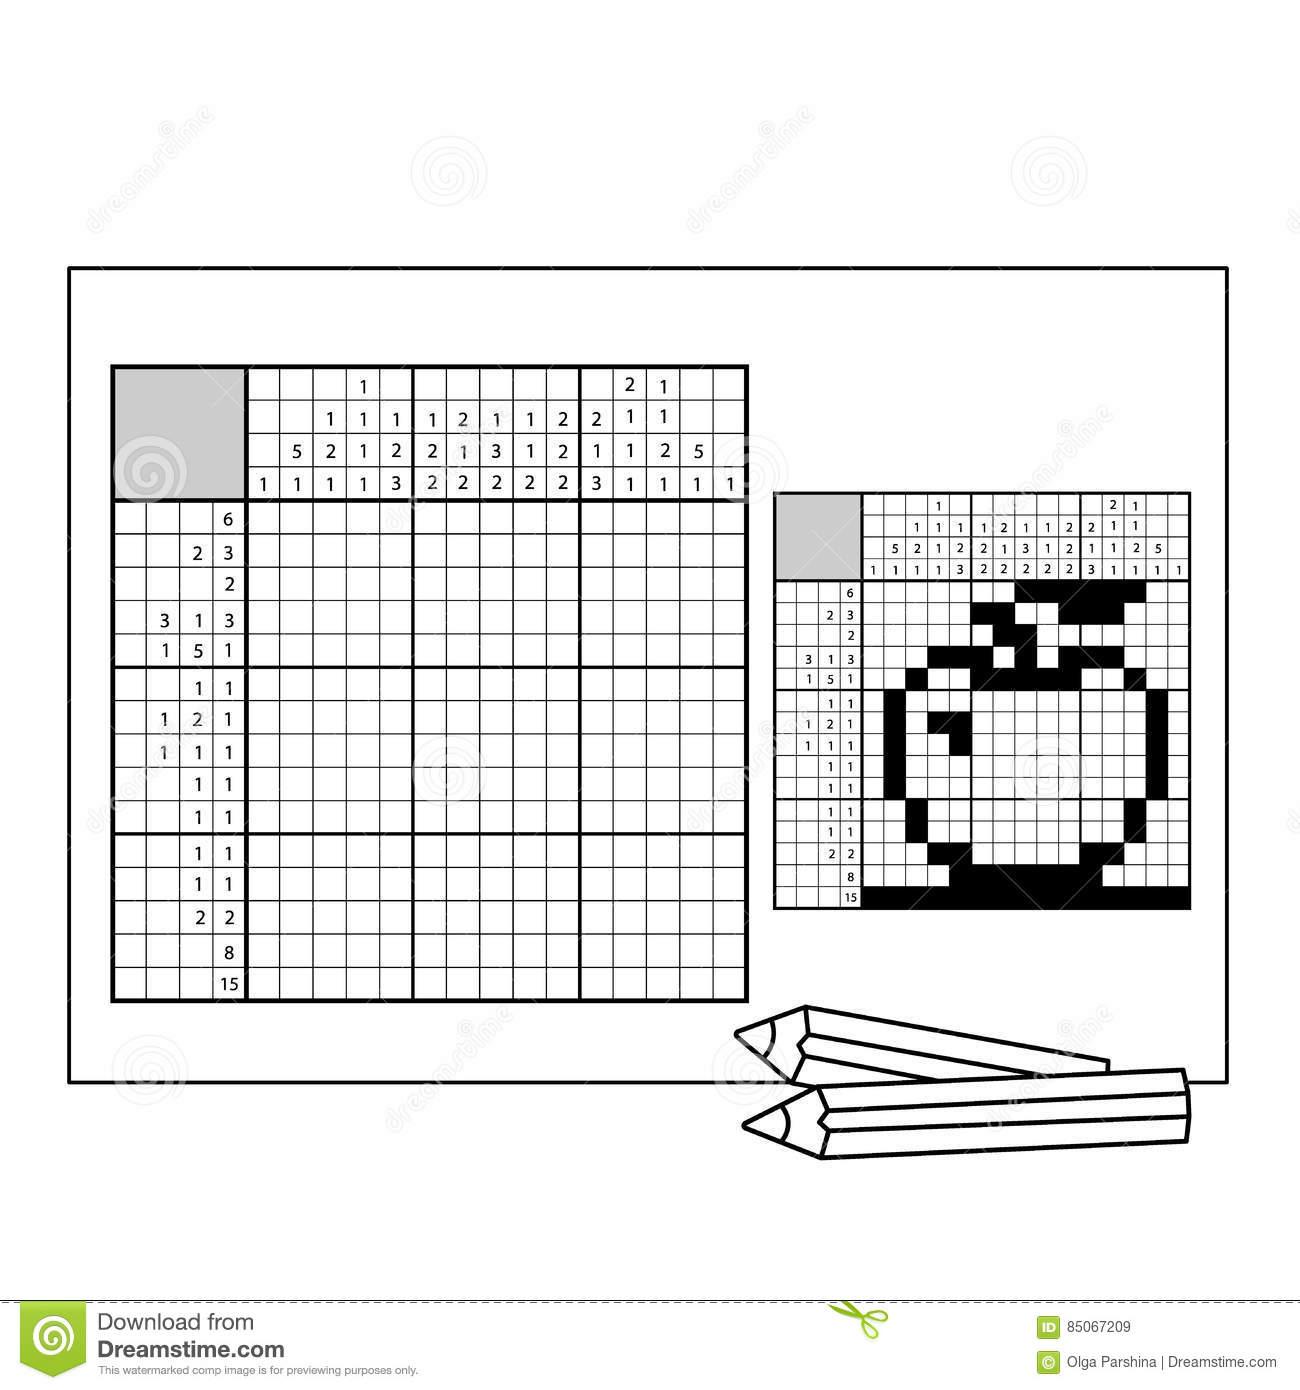 Apple. Black And White Japanese Crossword With Answer. Nonogram - Printable Nonogram Puzzles